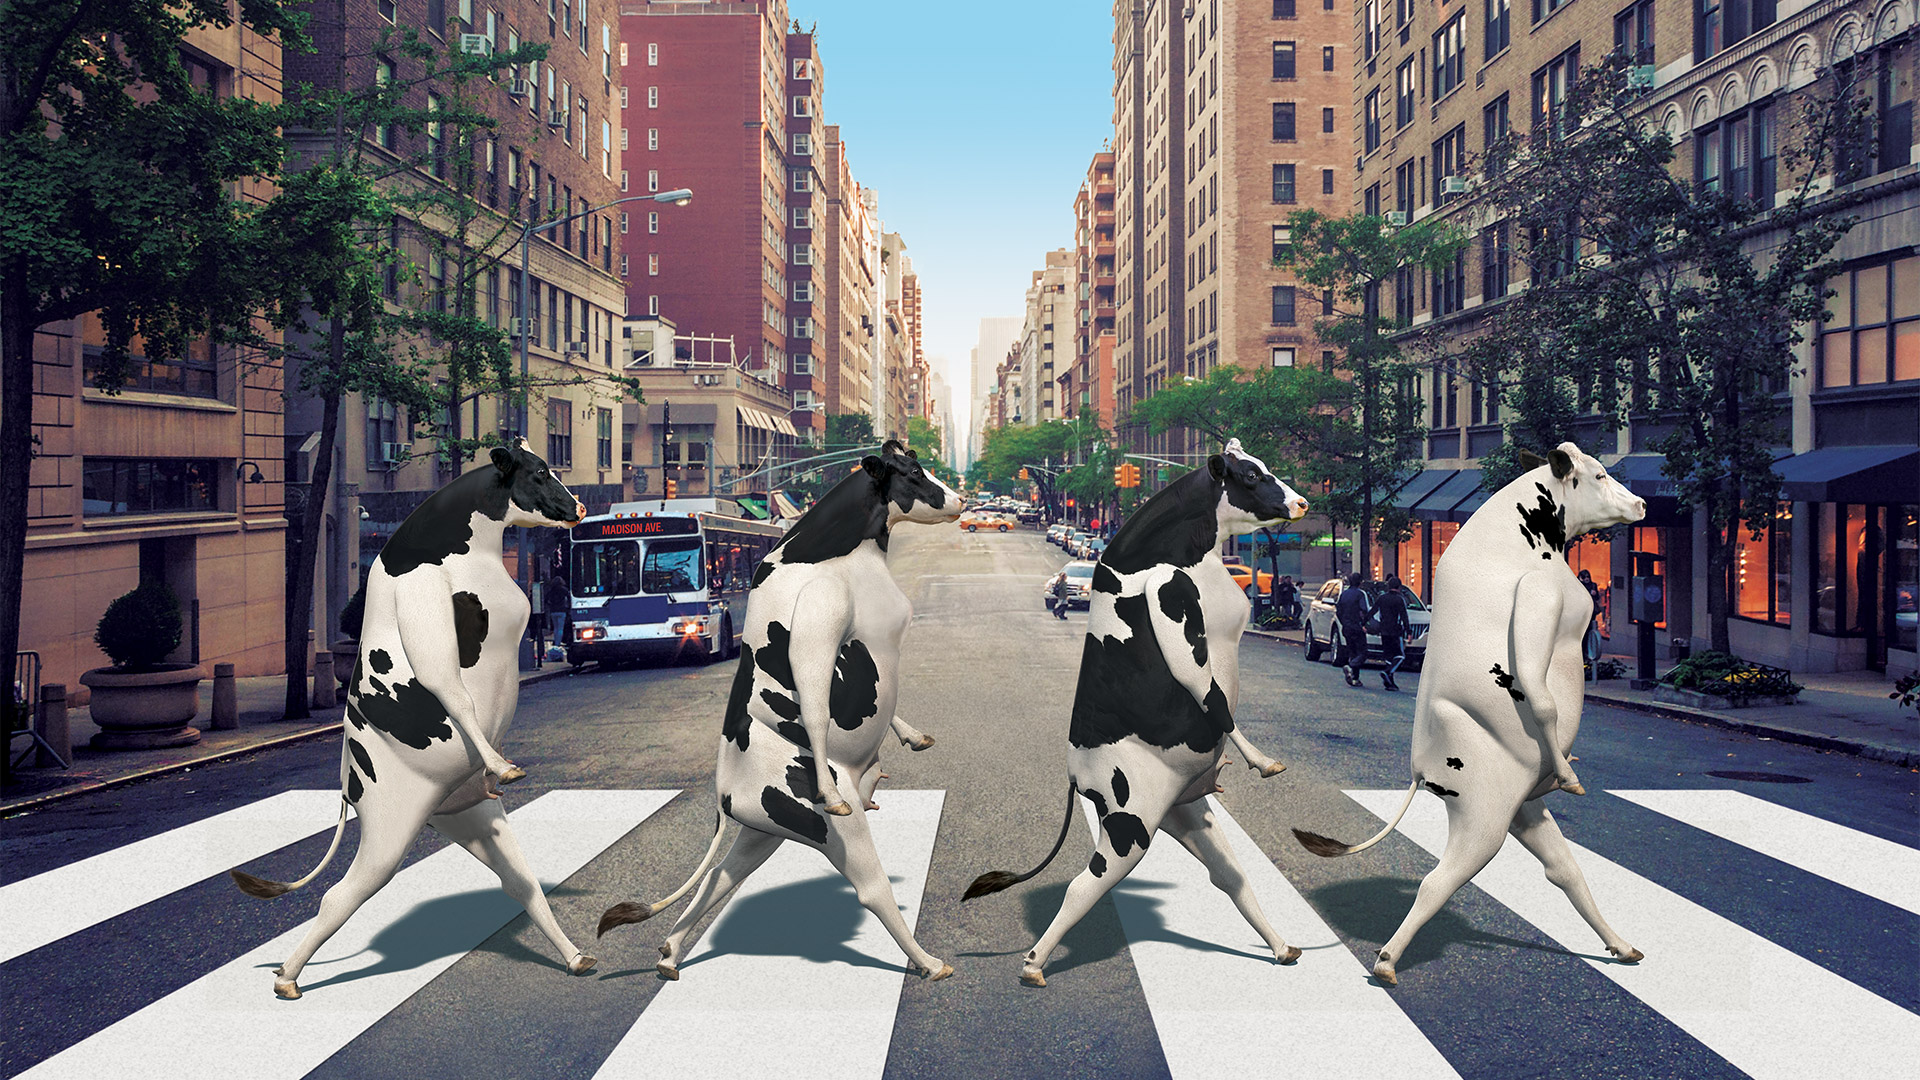 Abbey_Road_Cows.jpg